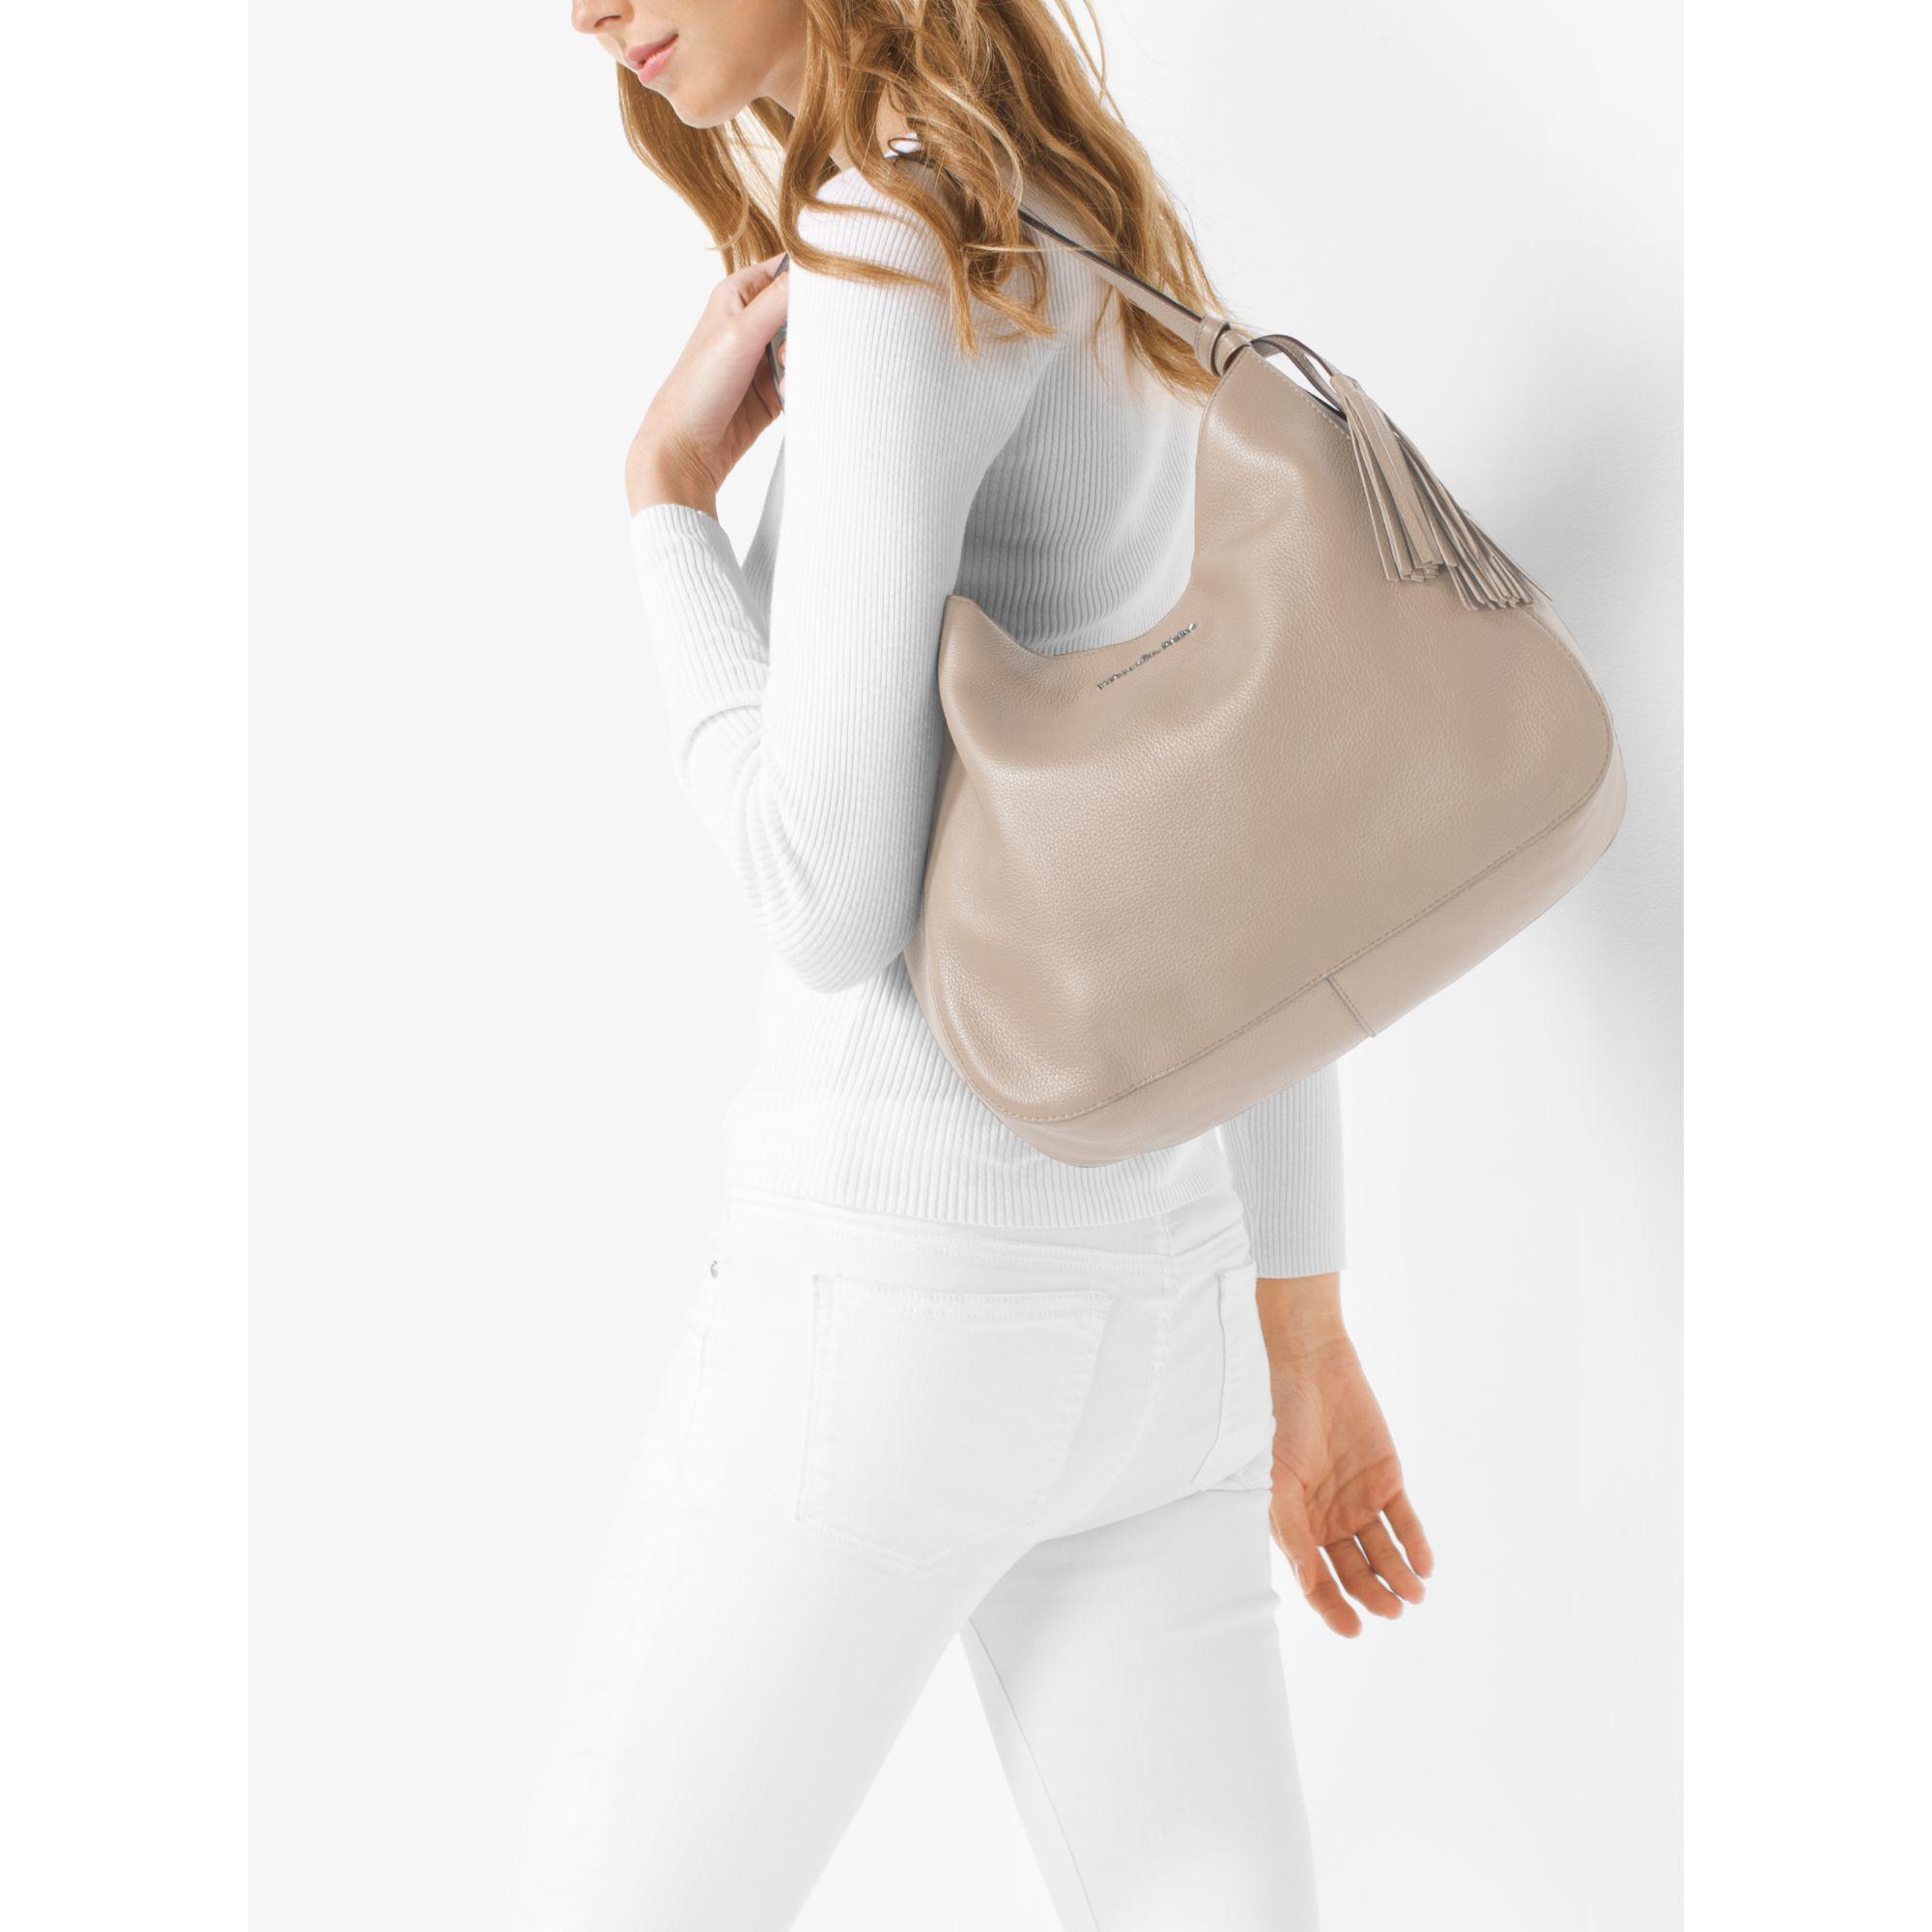 Michael kors Ashbury Large Leather Shoulder Bag in Natural | Lyst